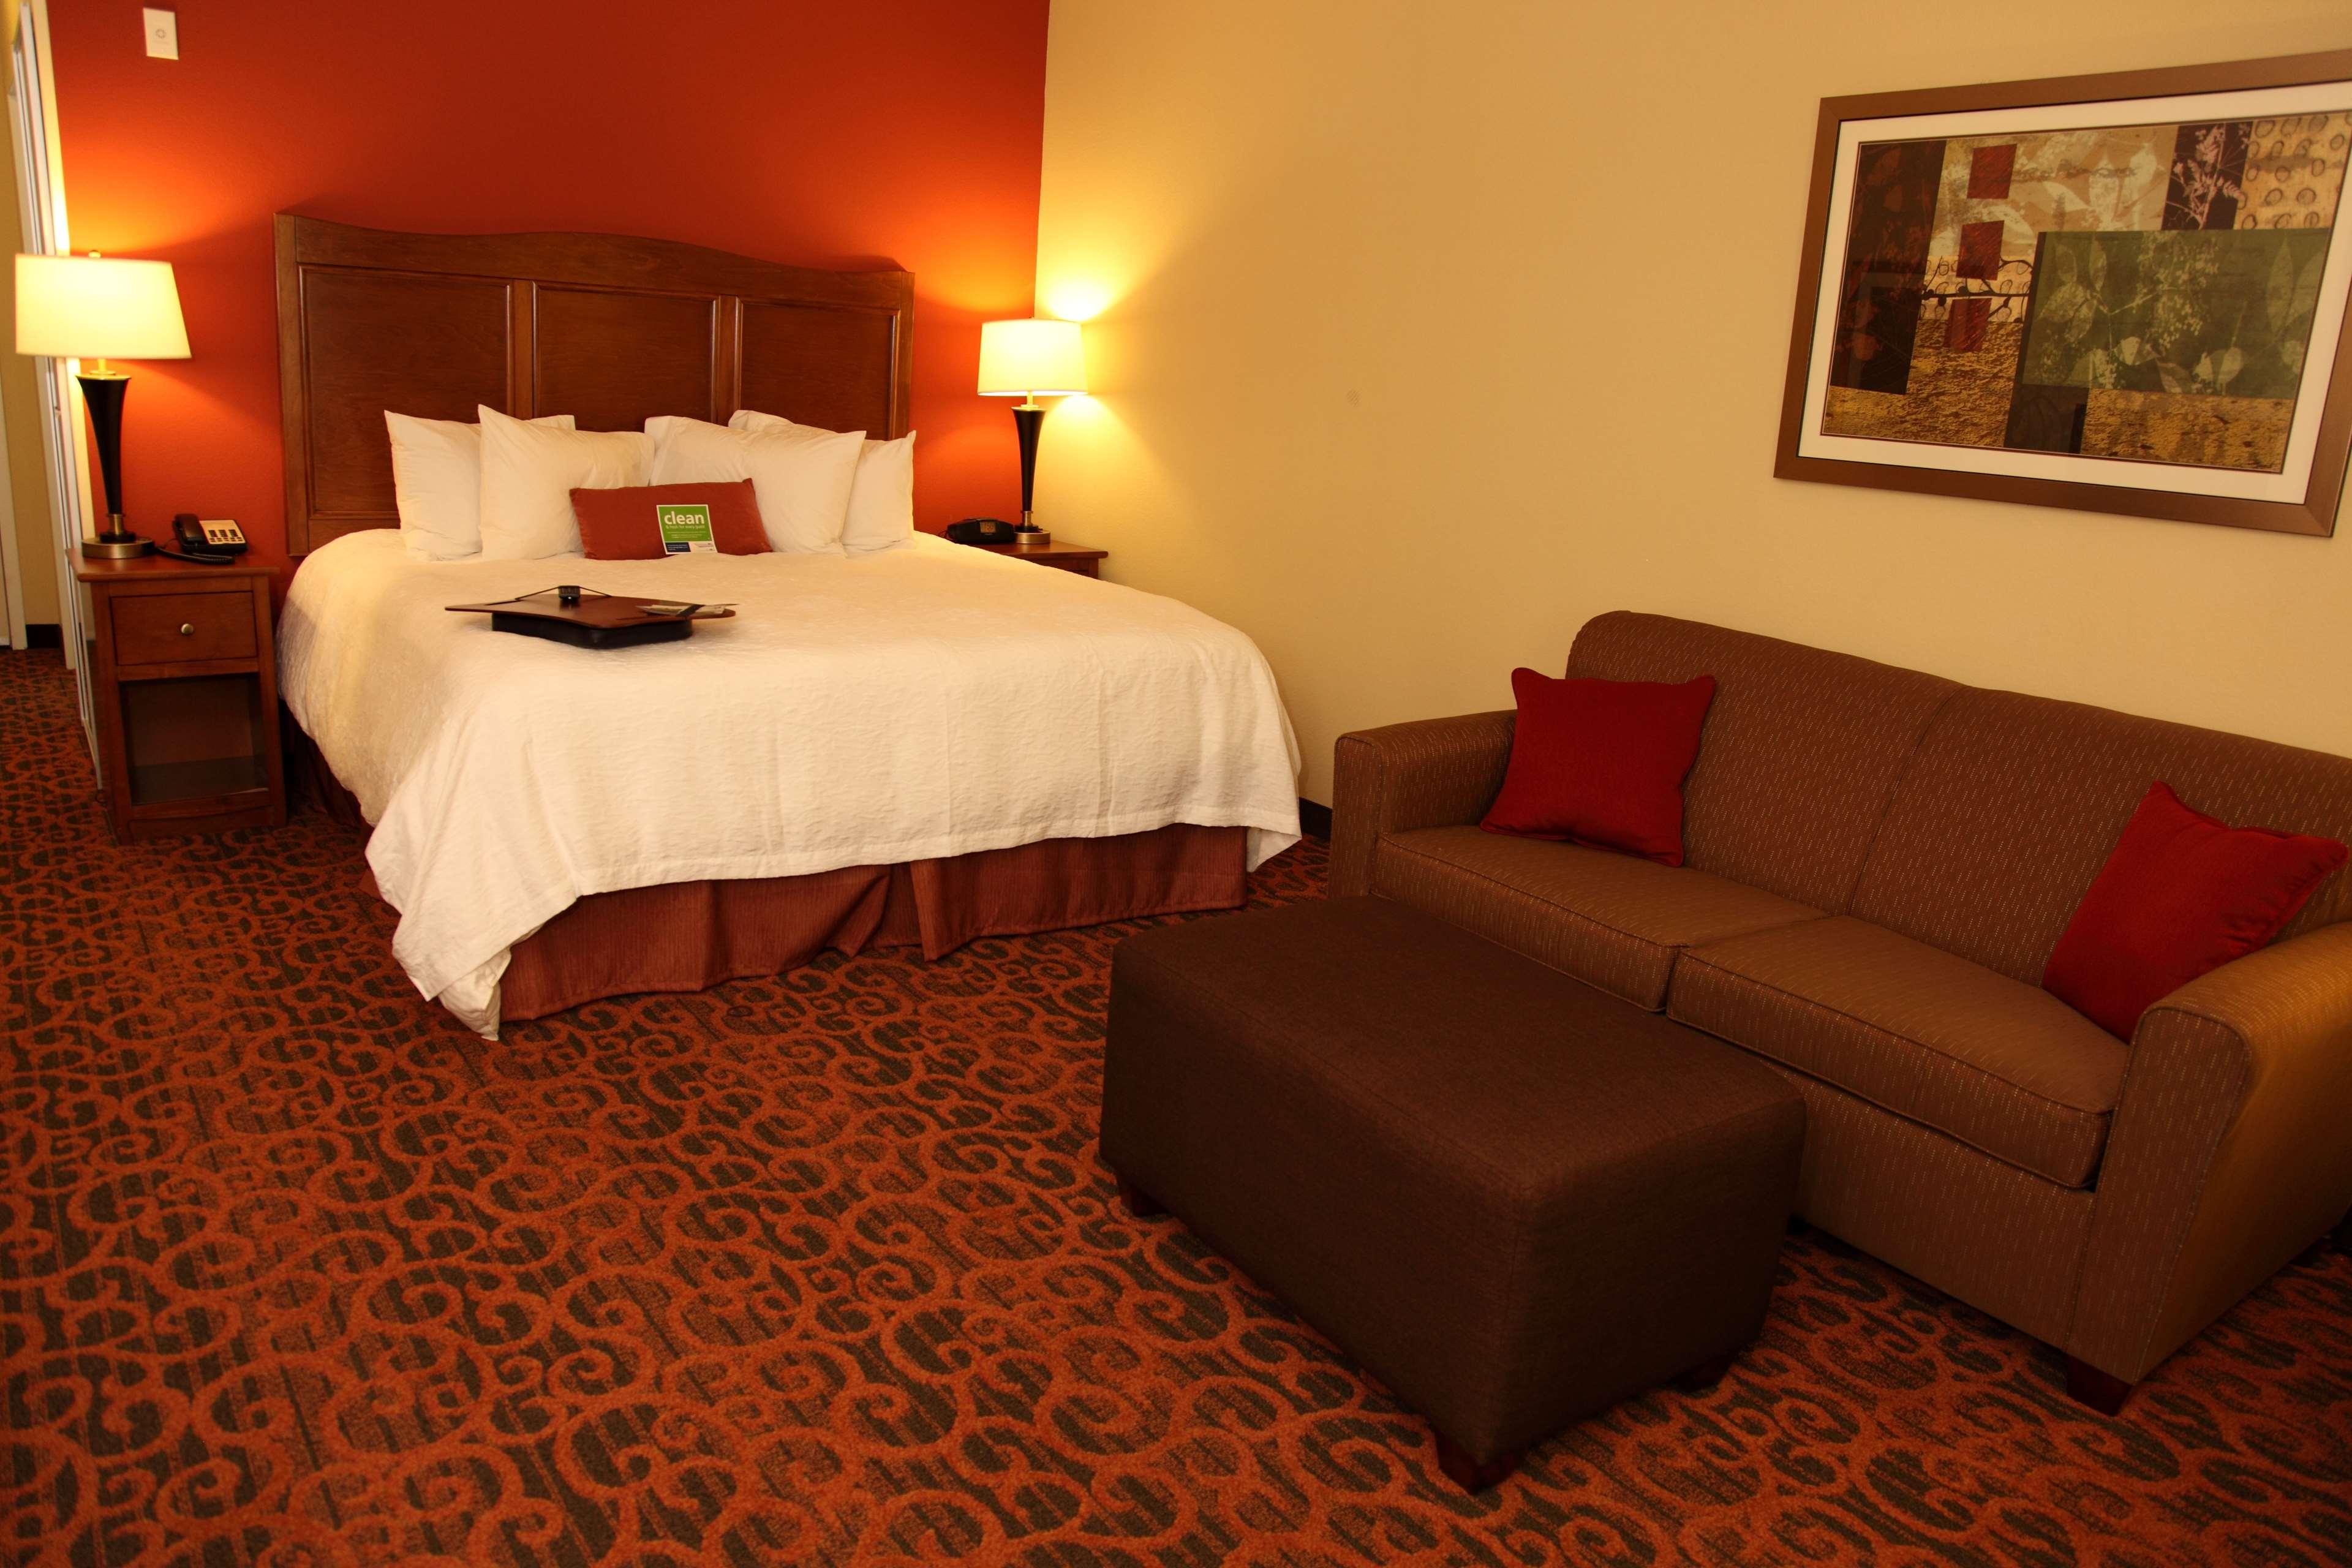 Hampton Inn & Suites Bastrop image 0